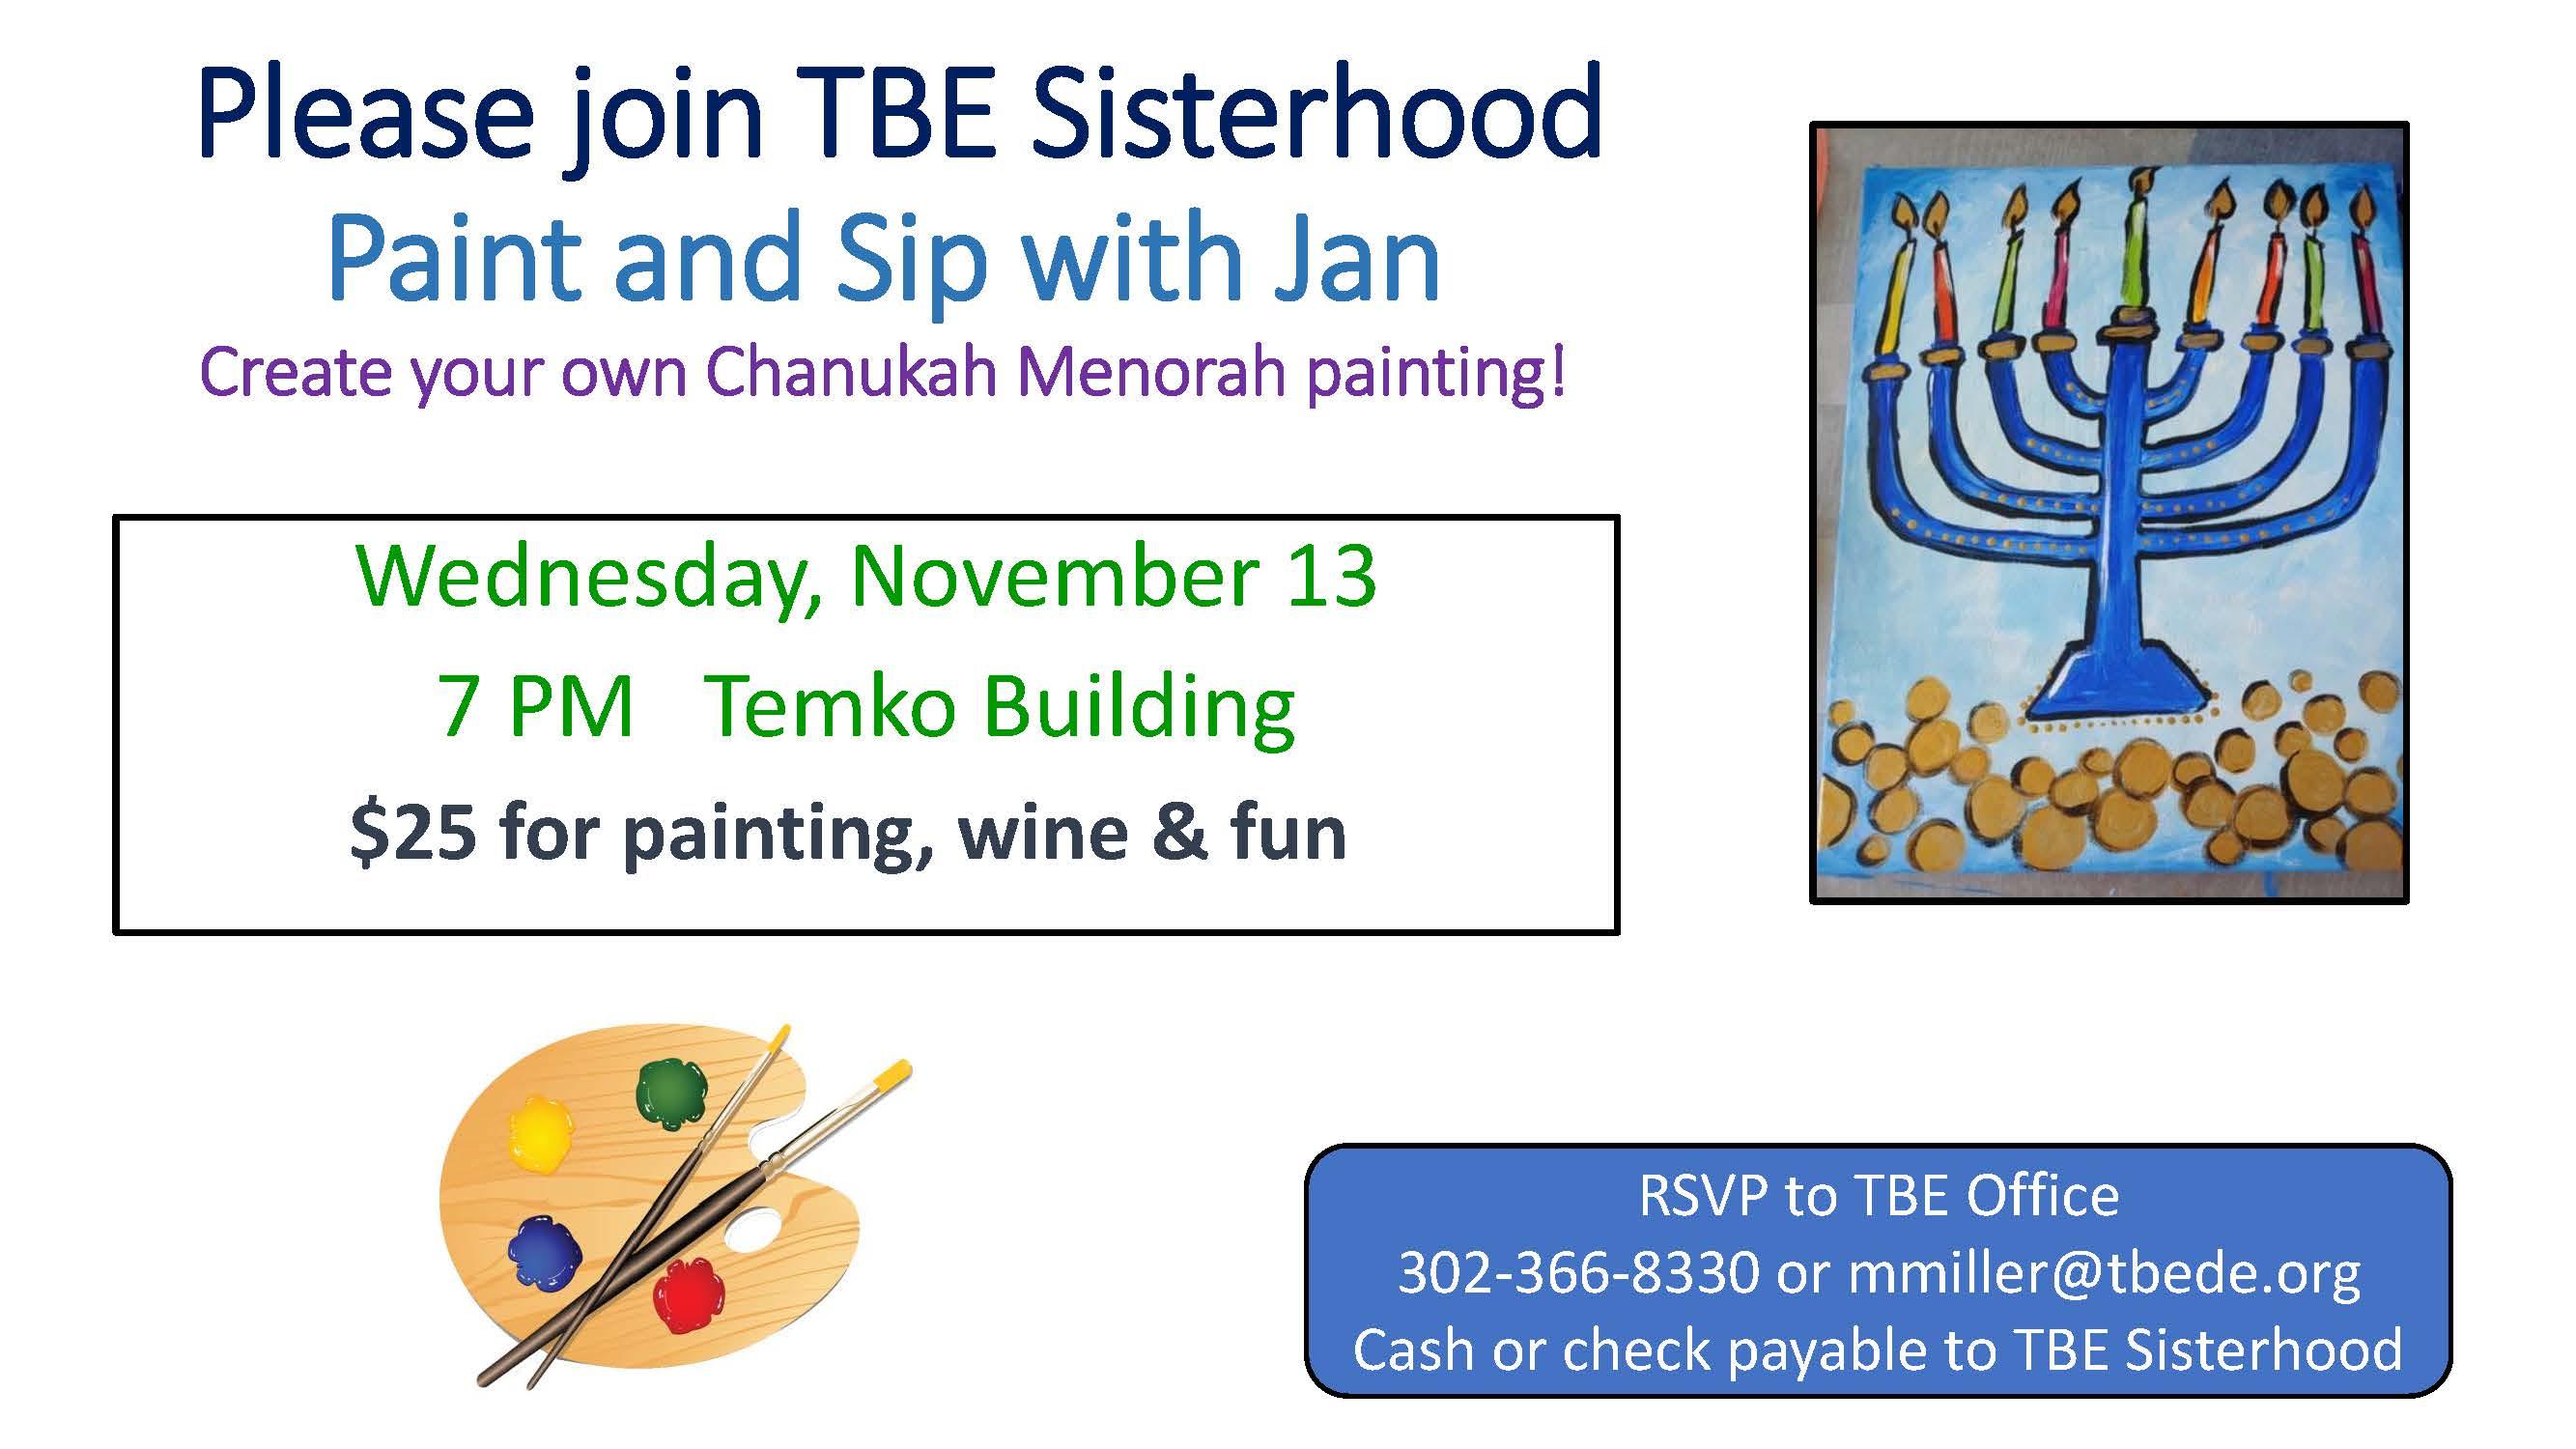 Sisterhood Paint and Sip